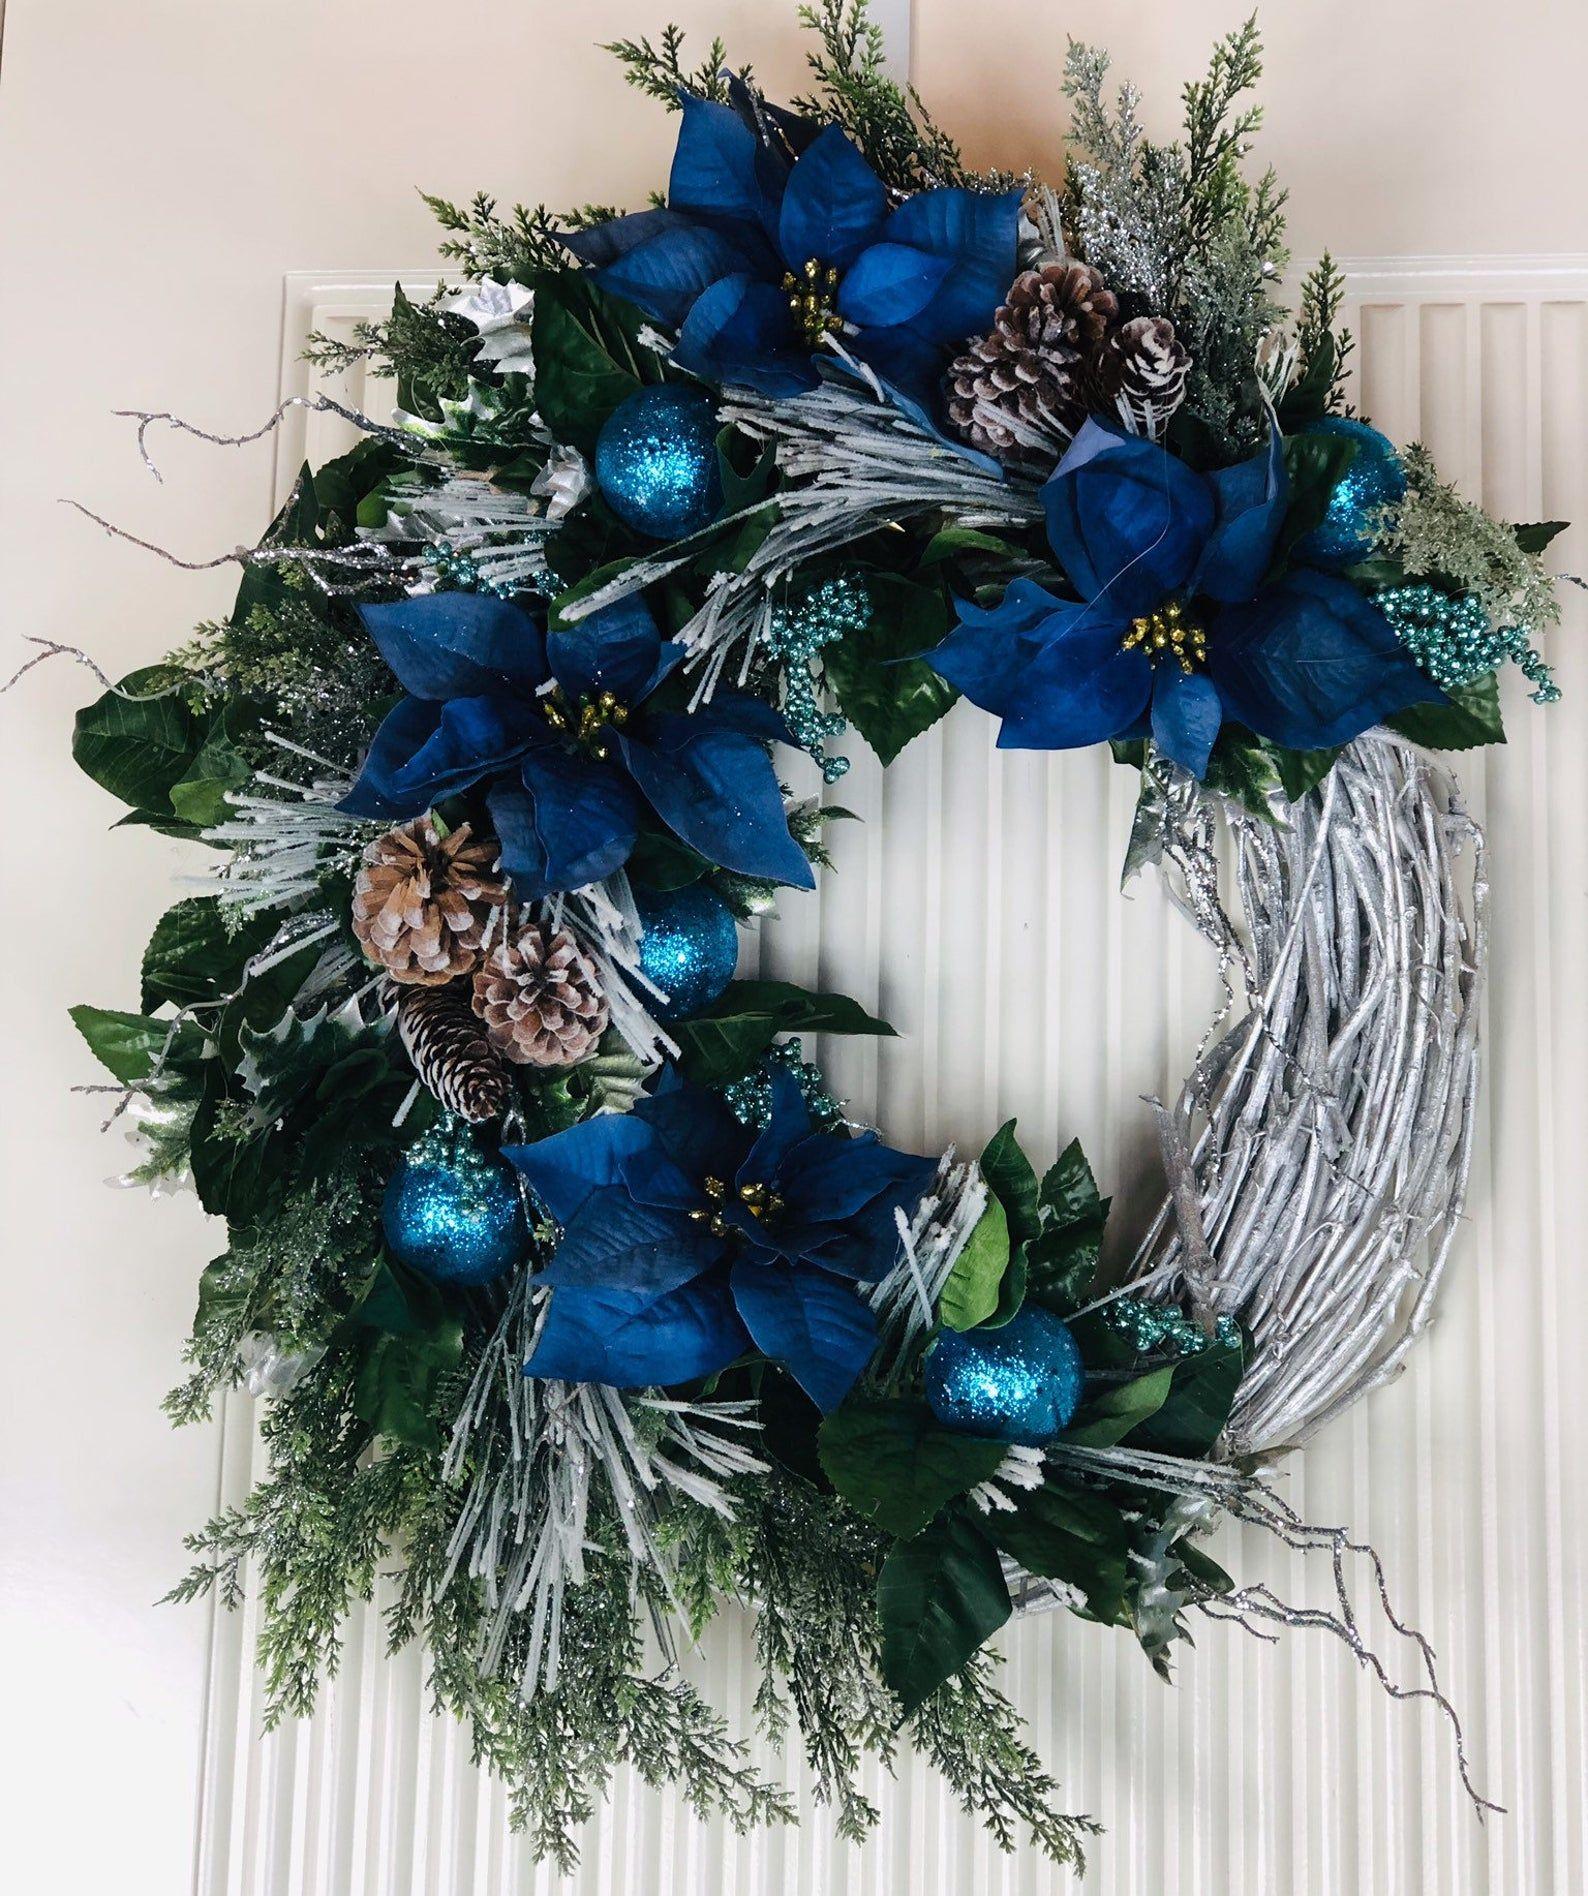 Photo of Poinsettia Wreath, Farmhouse Wreath, Christmas Wreath, Pine Juniper Wreath, Fall Decor, Christmas Wreath, Southern Charm Wreath, Fall Wreath